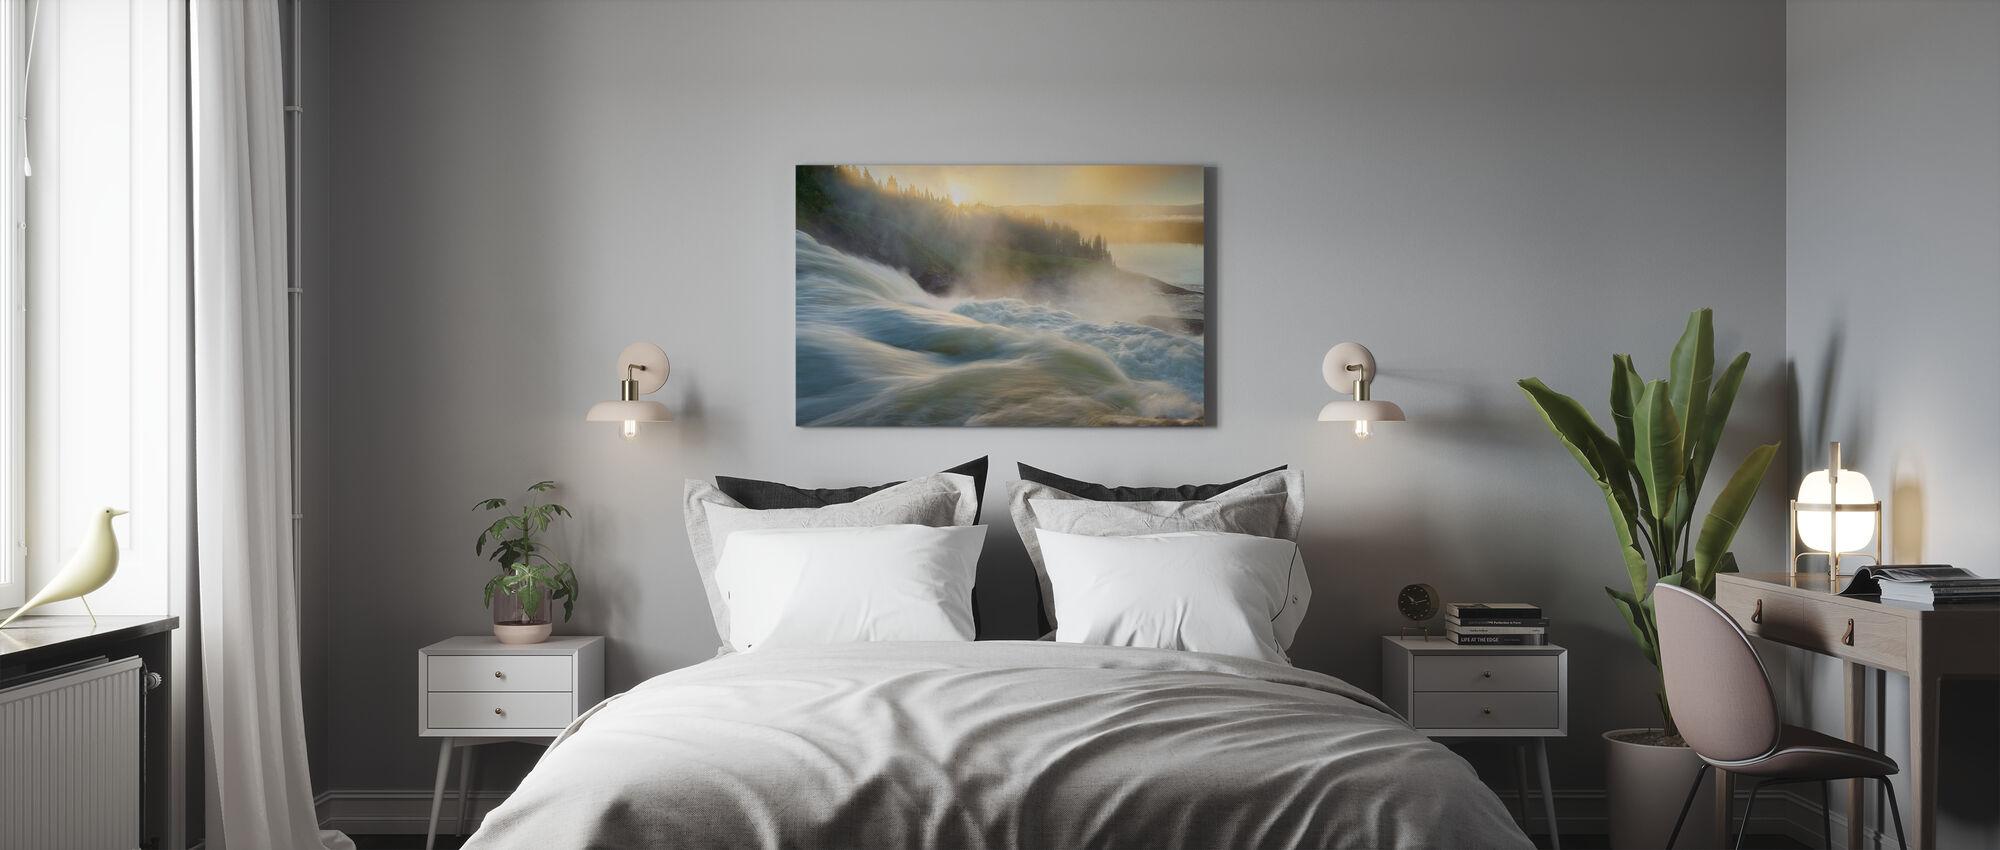 Jämtland River at Dawn, Sweden - Canvas print - Bedroom